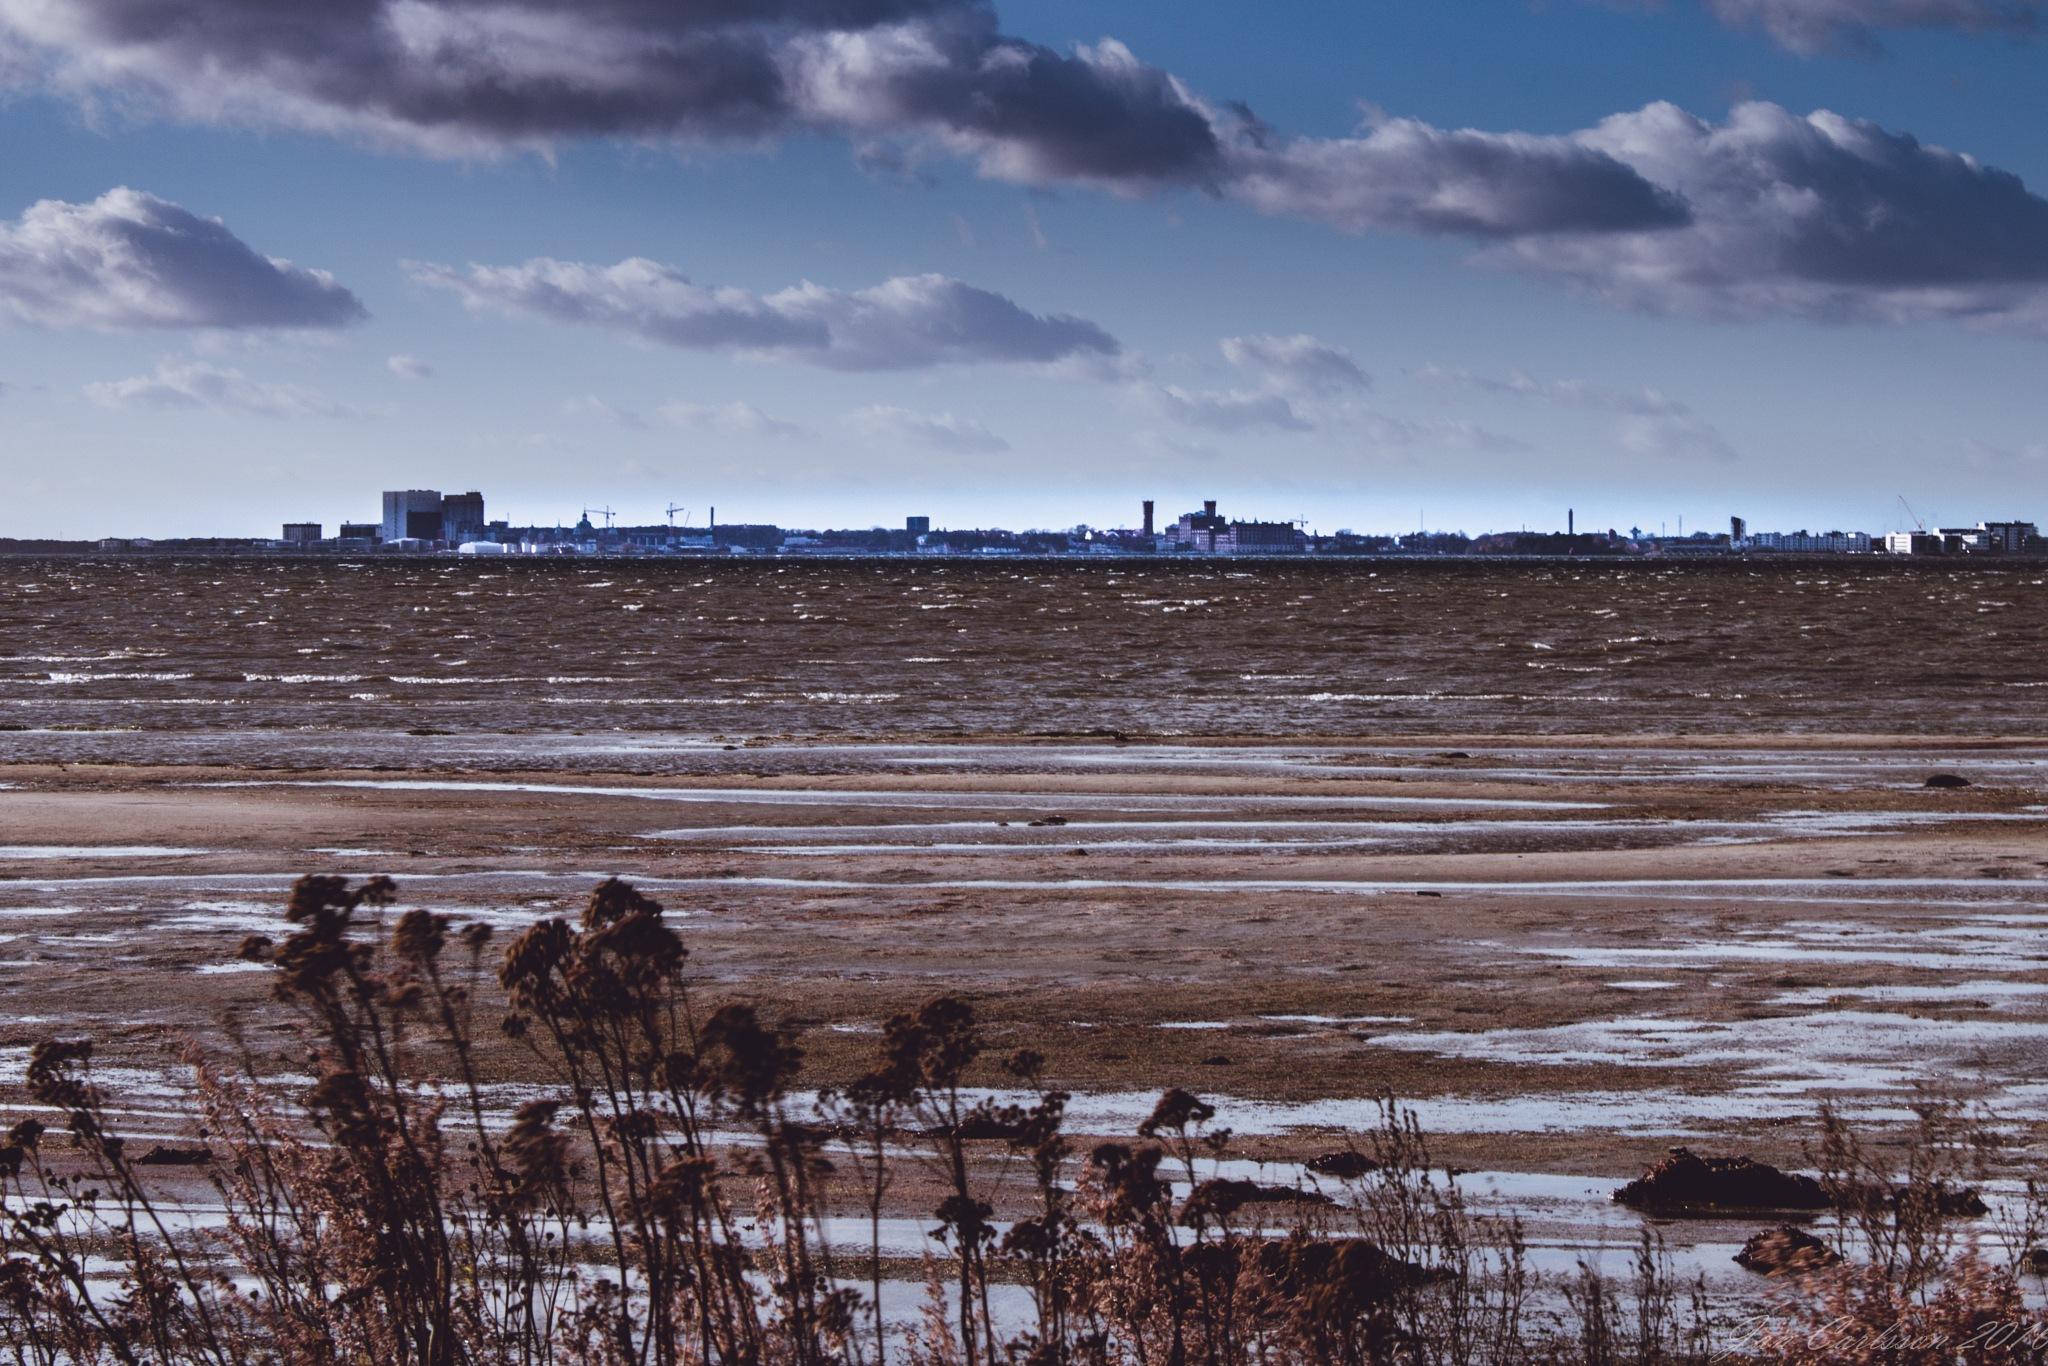 The City of Kalmar seen from The Island of Öland by carljan w carlsson